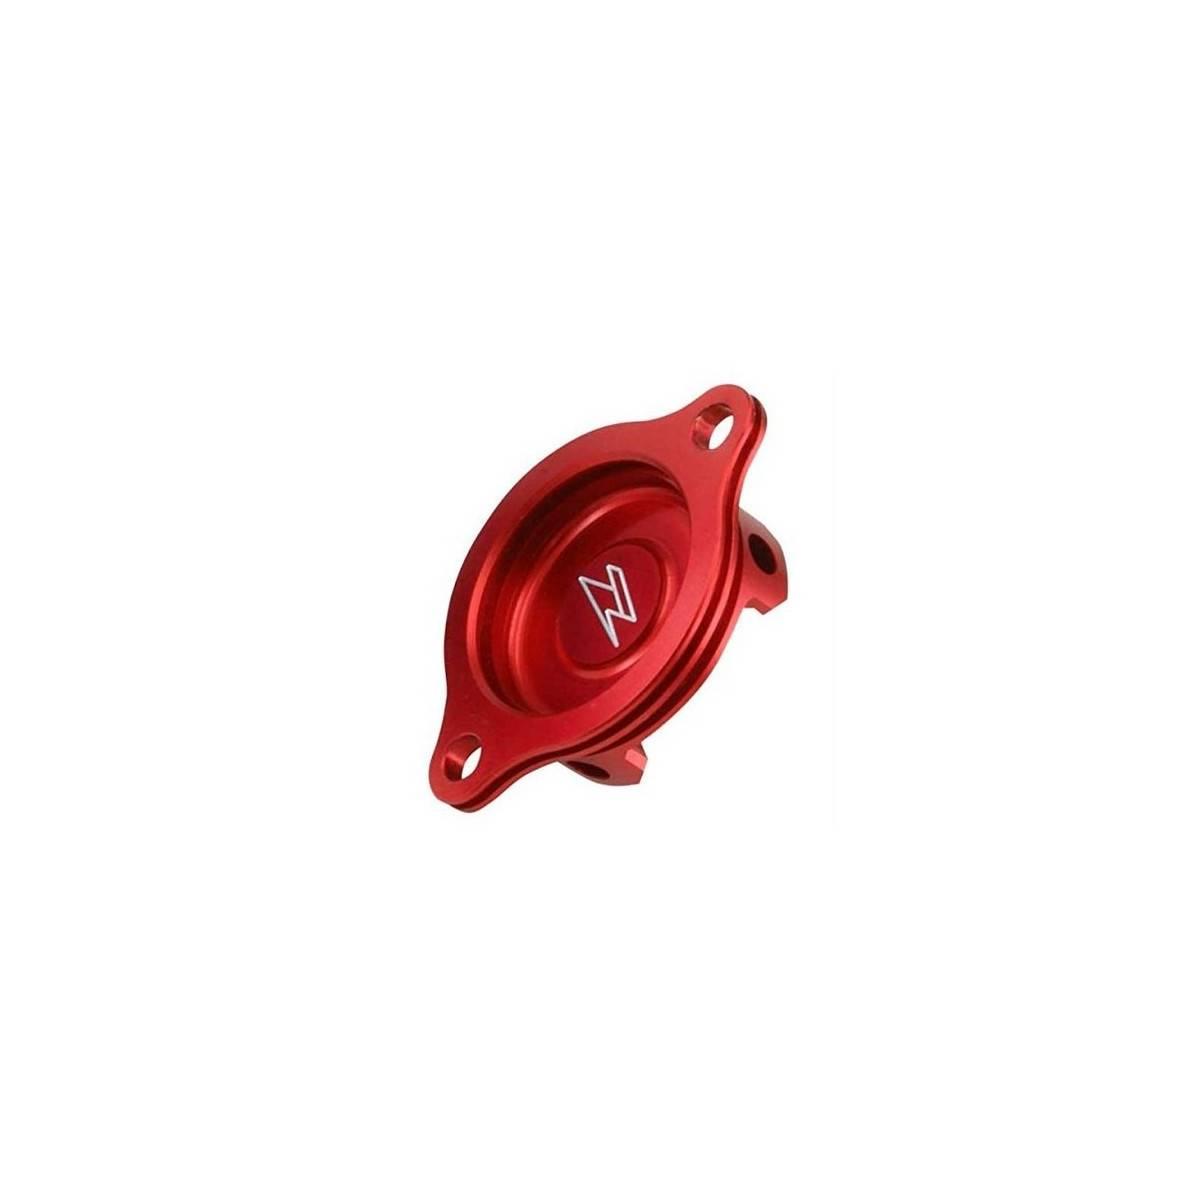 ZE90.1153 - Tapa Filtro Aceite Zeta Kx250F´05-, Rmz250´05-06 Rojo